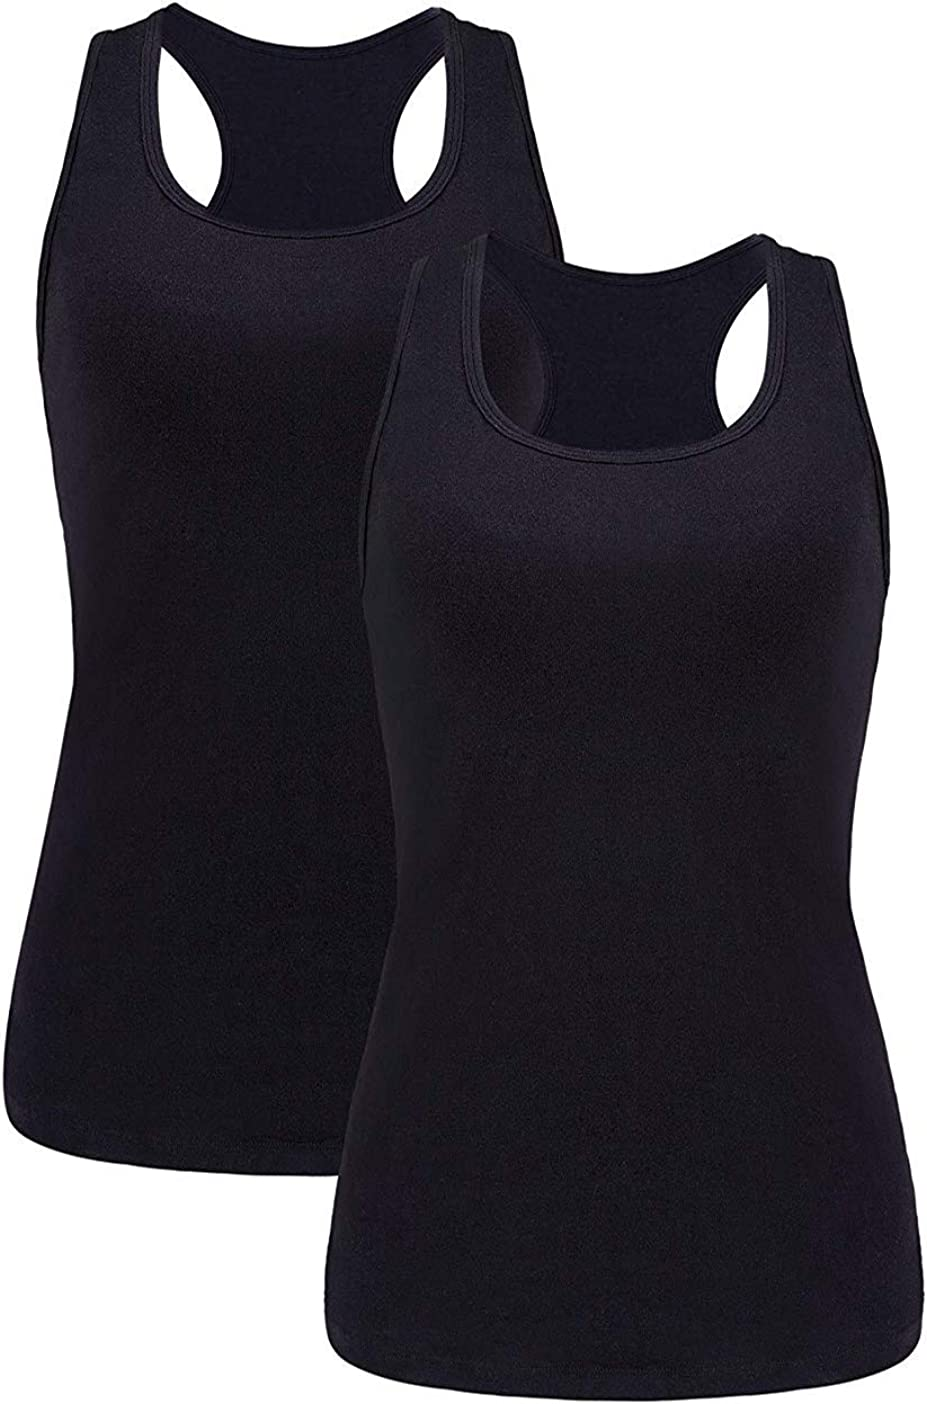 beautyin Women Basic Racerback Tank Top Shelf Bra Undershirt Wide Strap Yoga Top